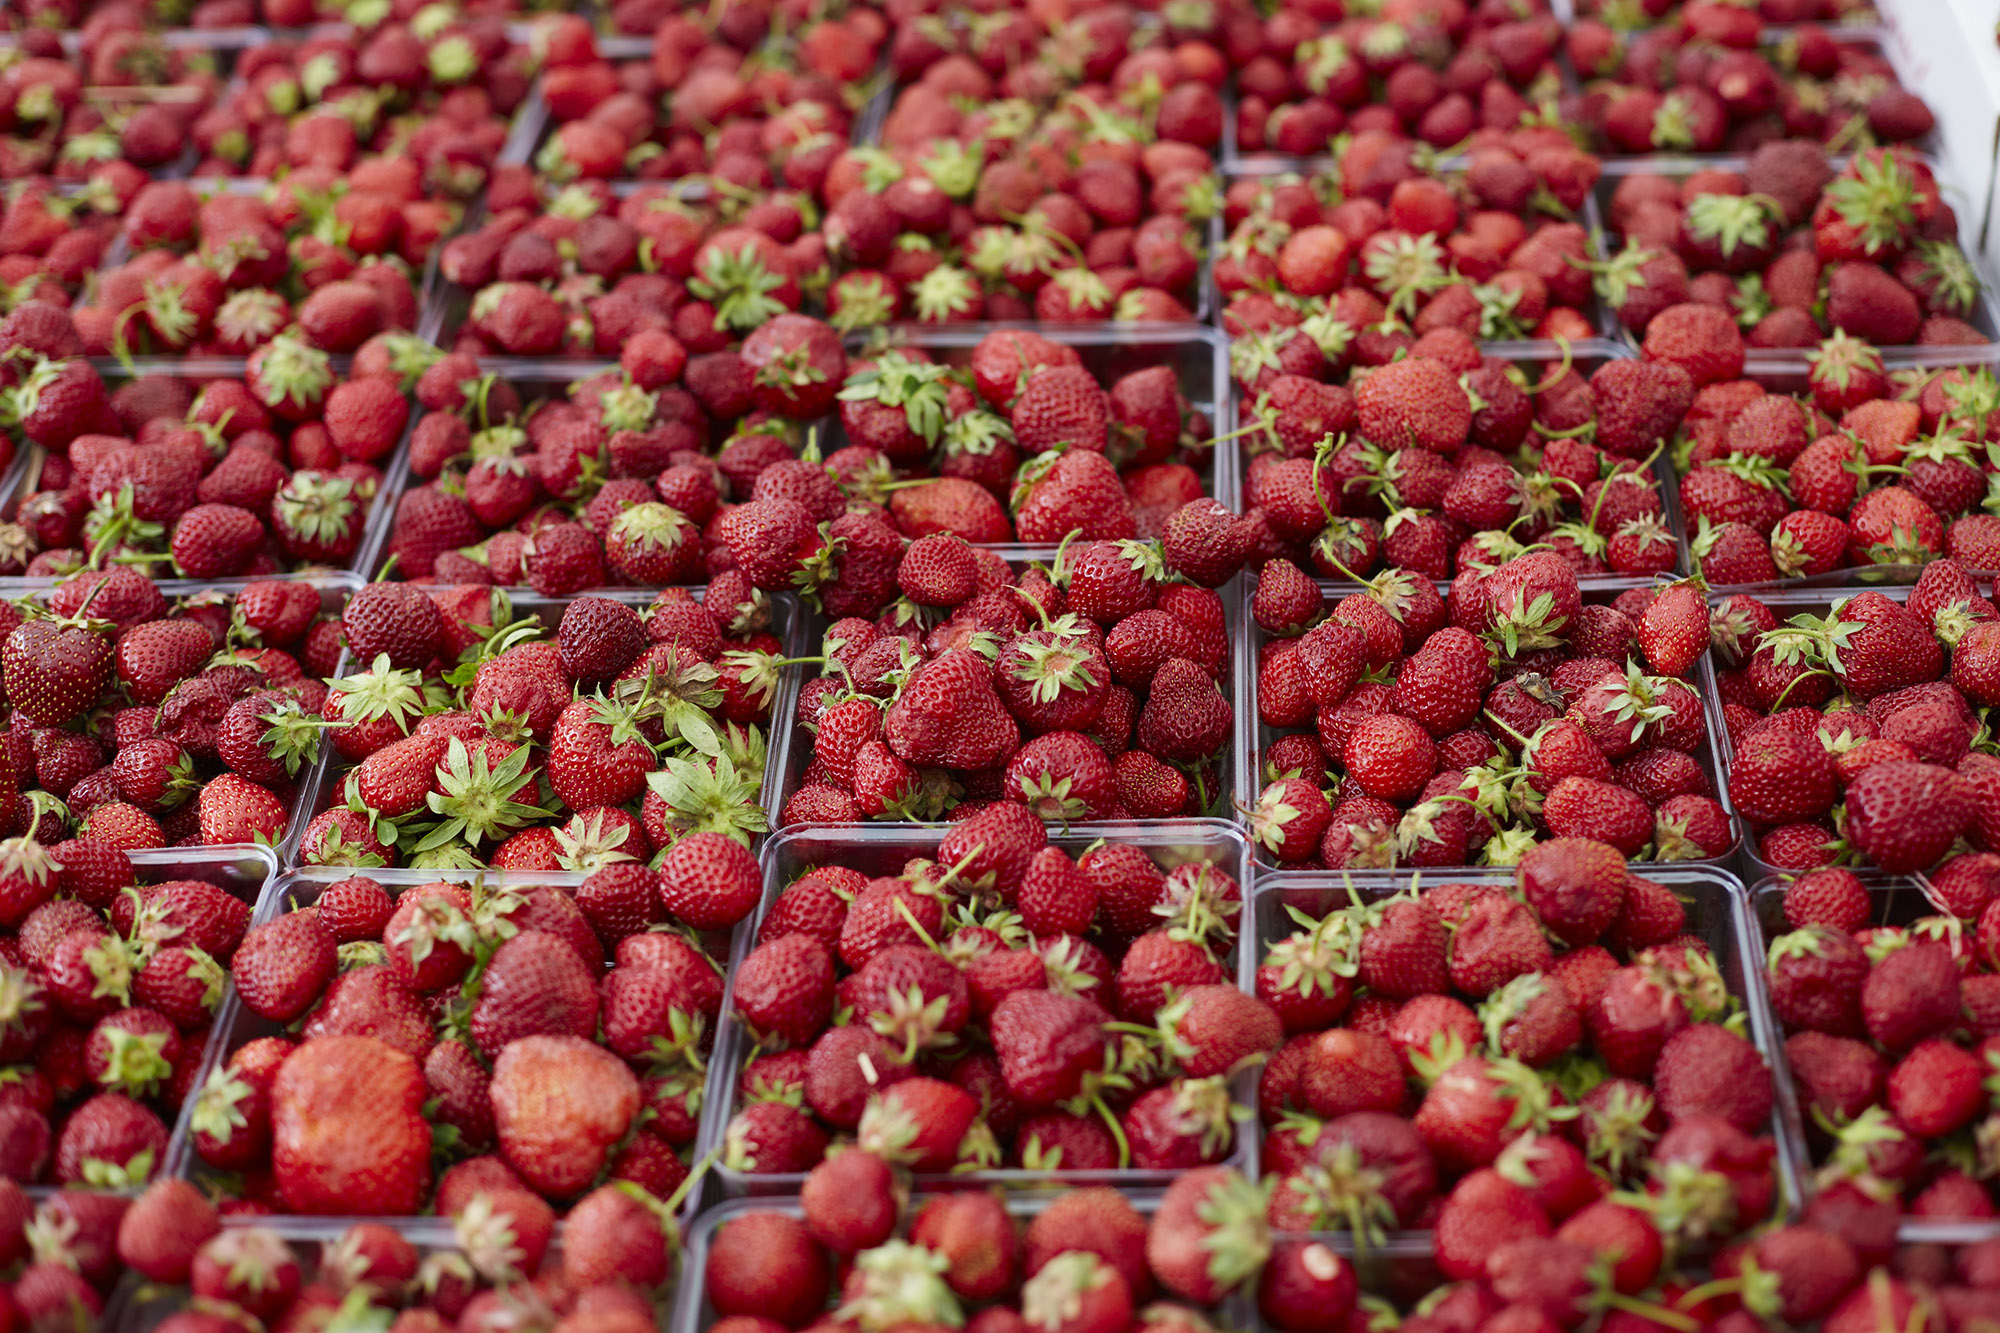 Strawberries in abundance.